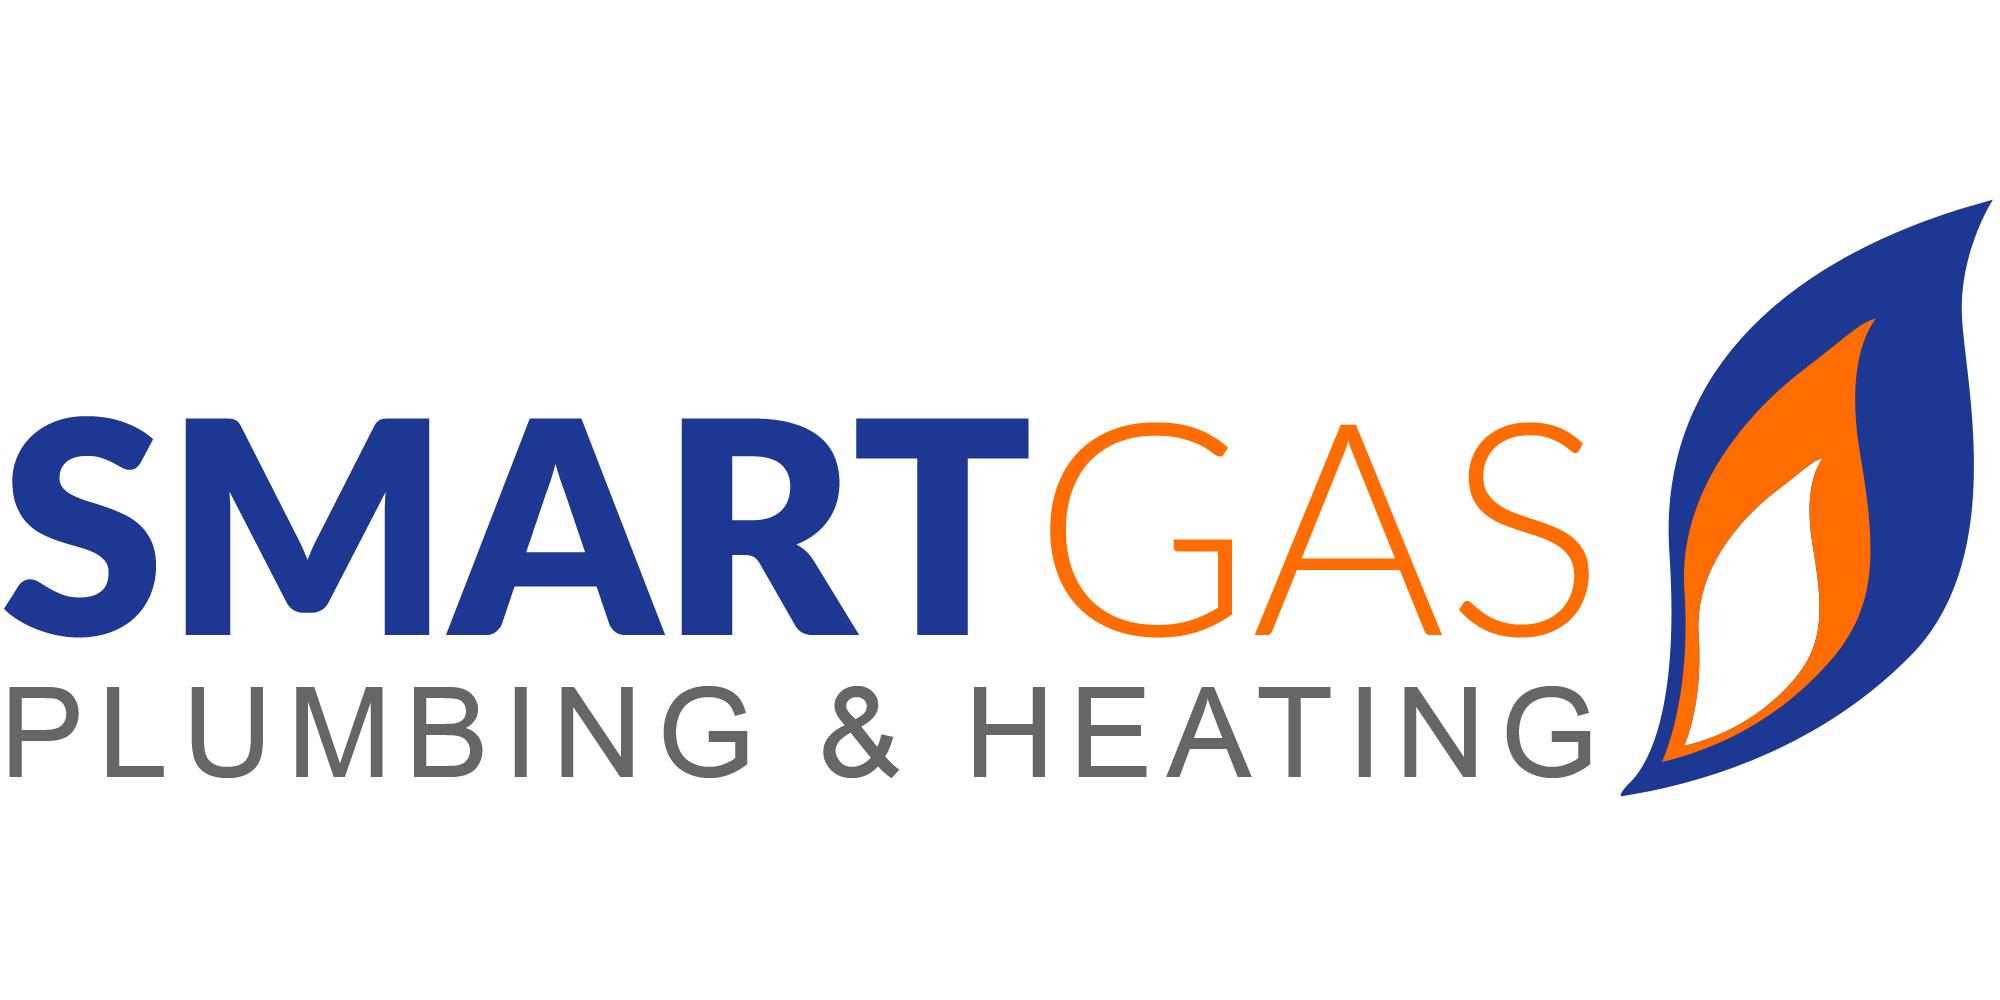 Smart Gas Plumbing & Heating Ltd Verified Logo